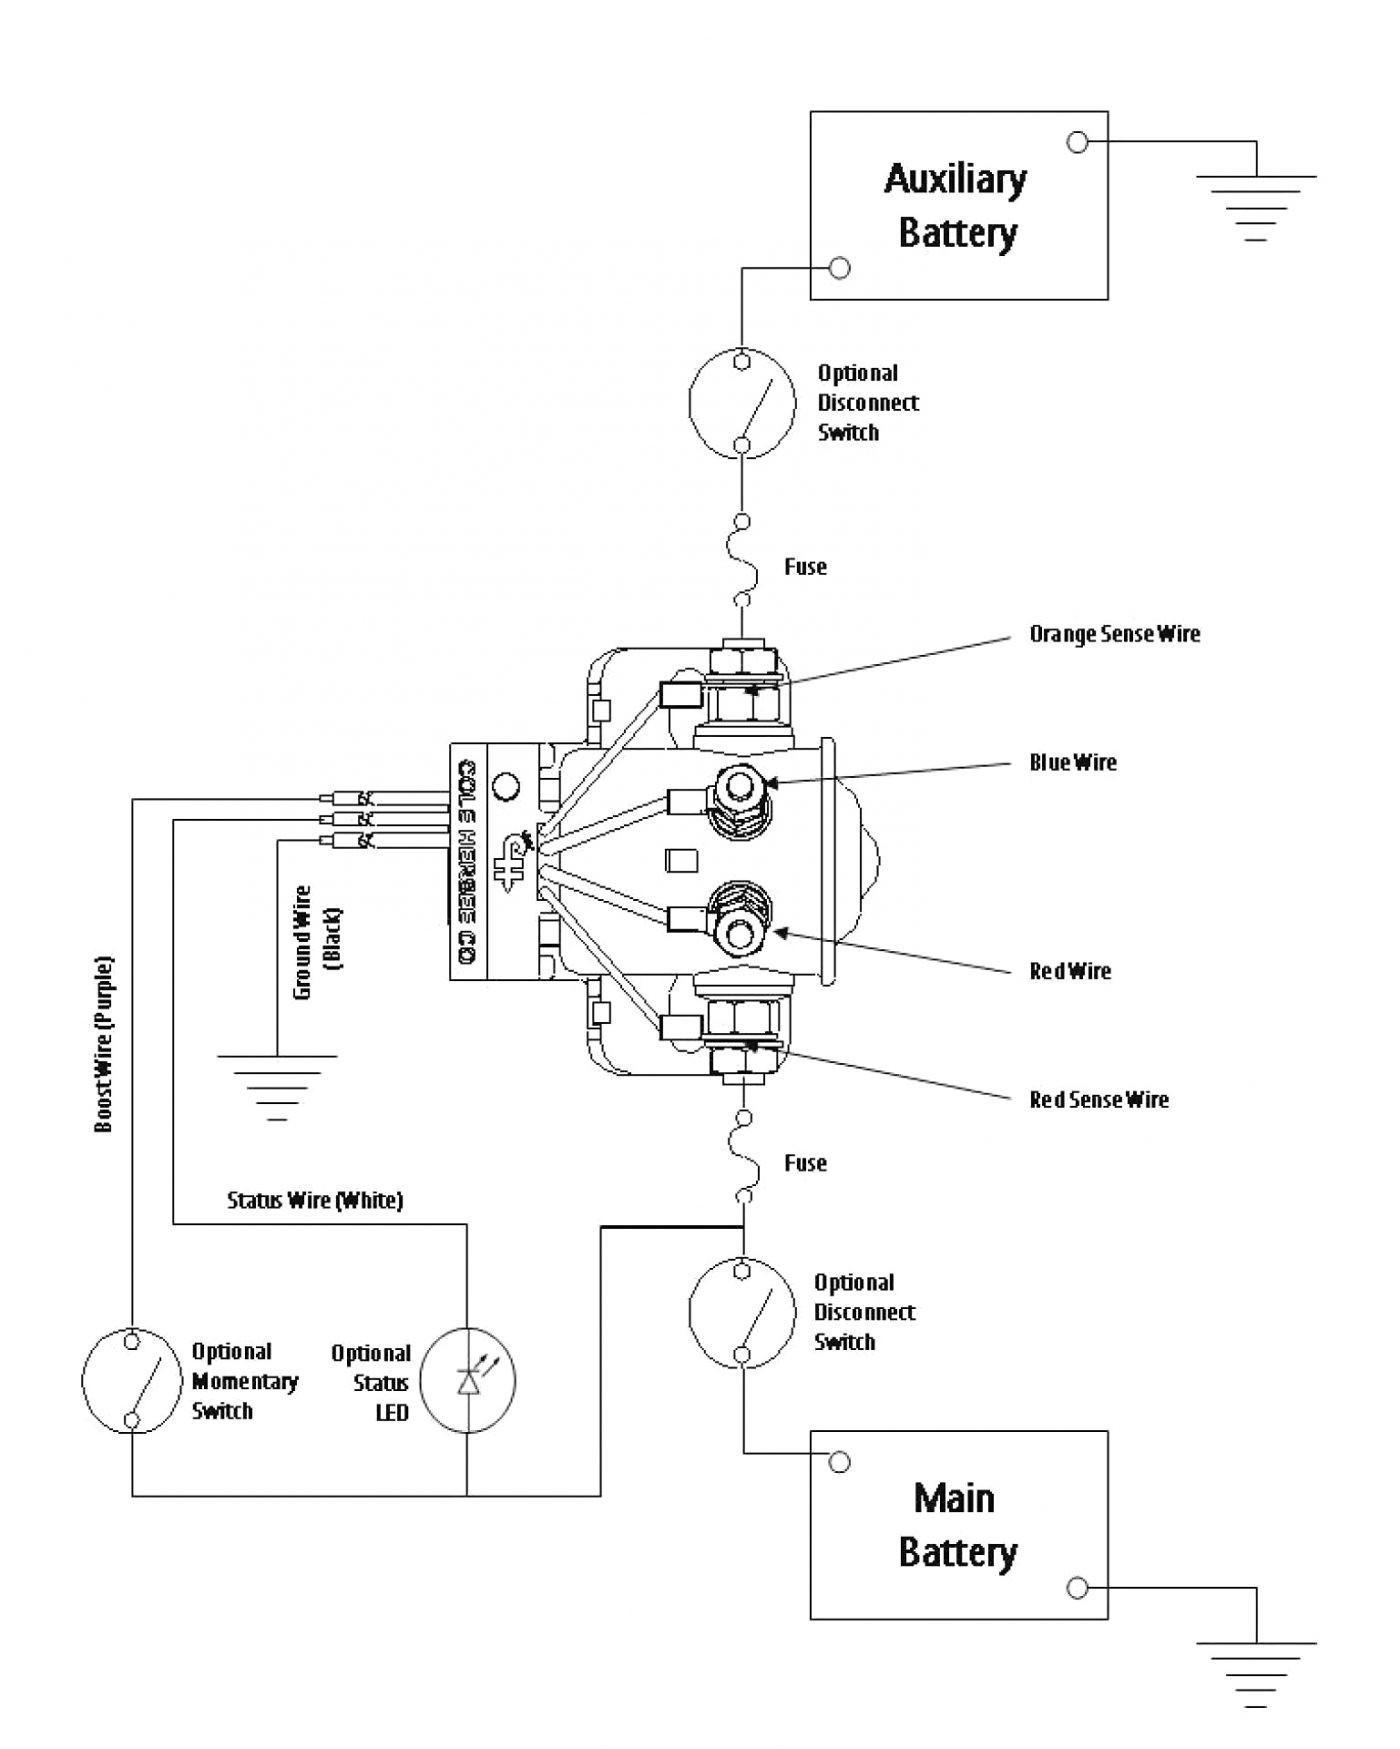 1985 Chevy Truck Wiring Diagram Tele Wiring Schematic Of 1985 Chevy Truck Wiring Diagram